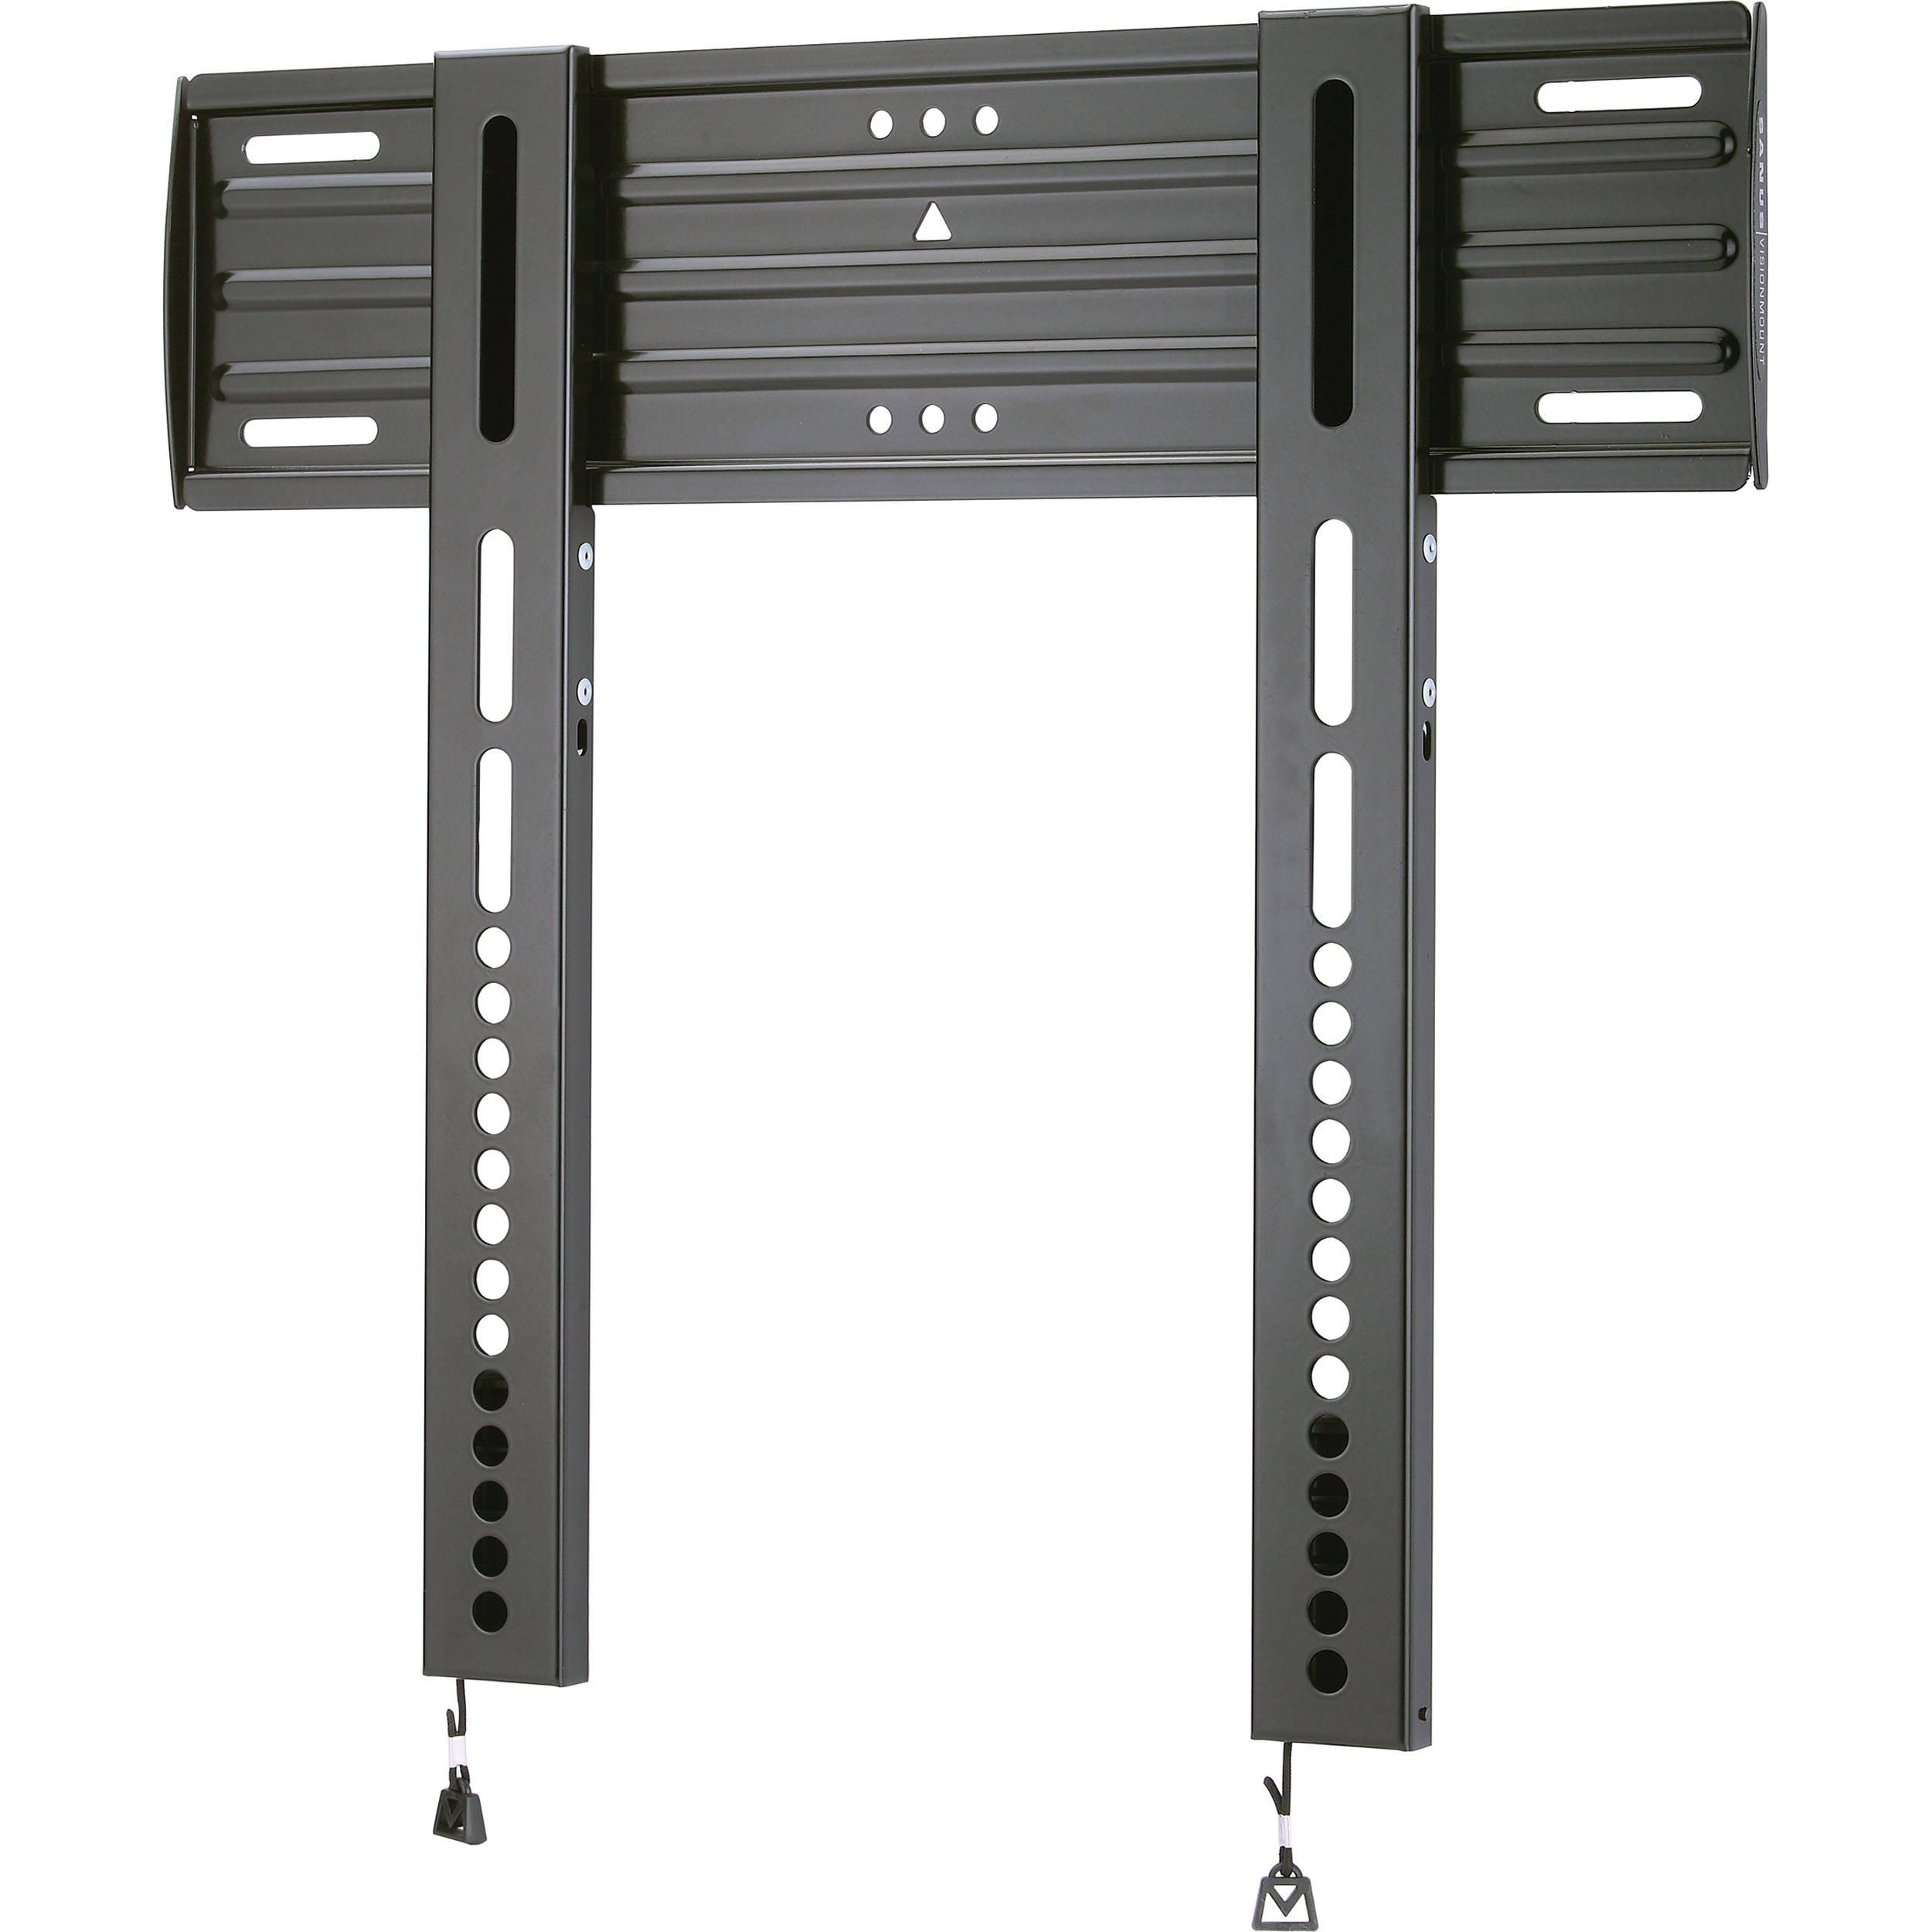 Sanus Vml10 Super Slim Low Profile Wall Mount Vml10 B1 B Amp H